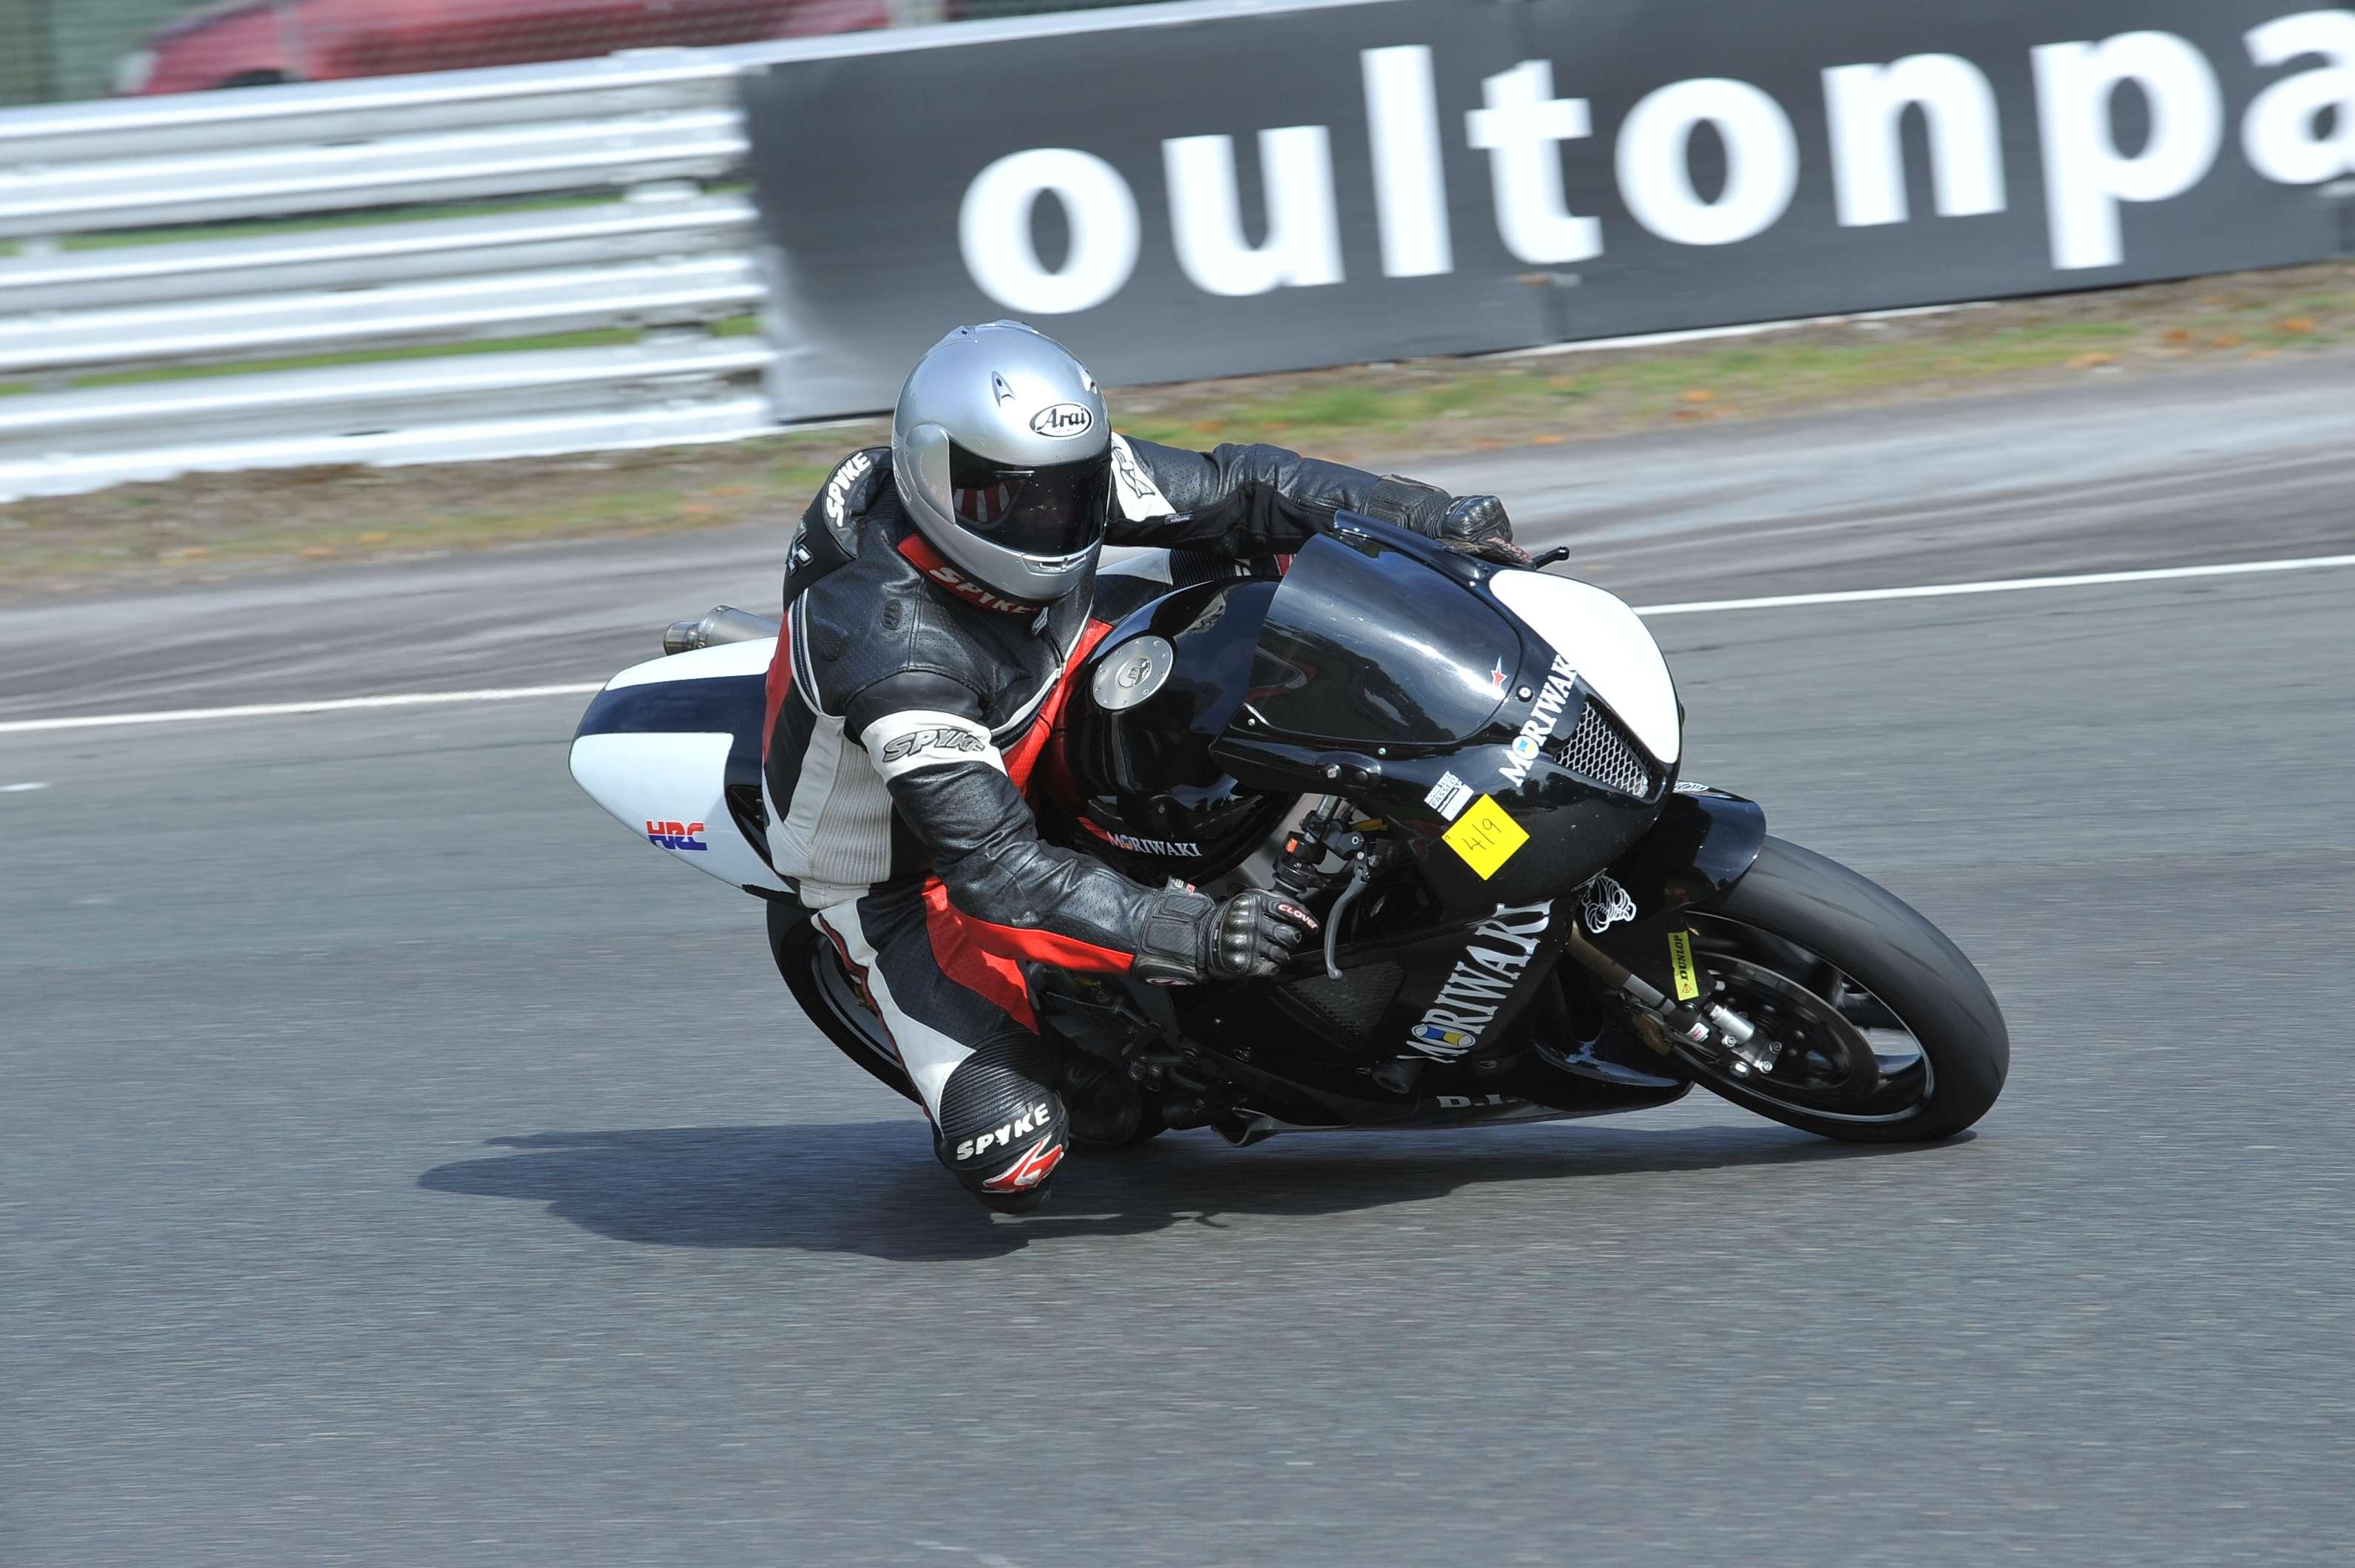 hi from the uk, sp1 track bike - honda rc51 forum : rc51